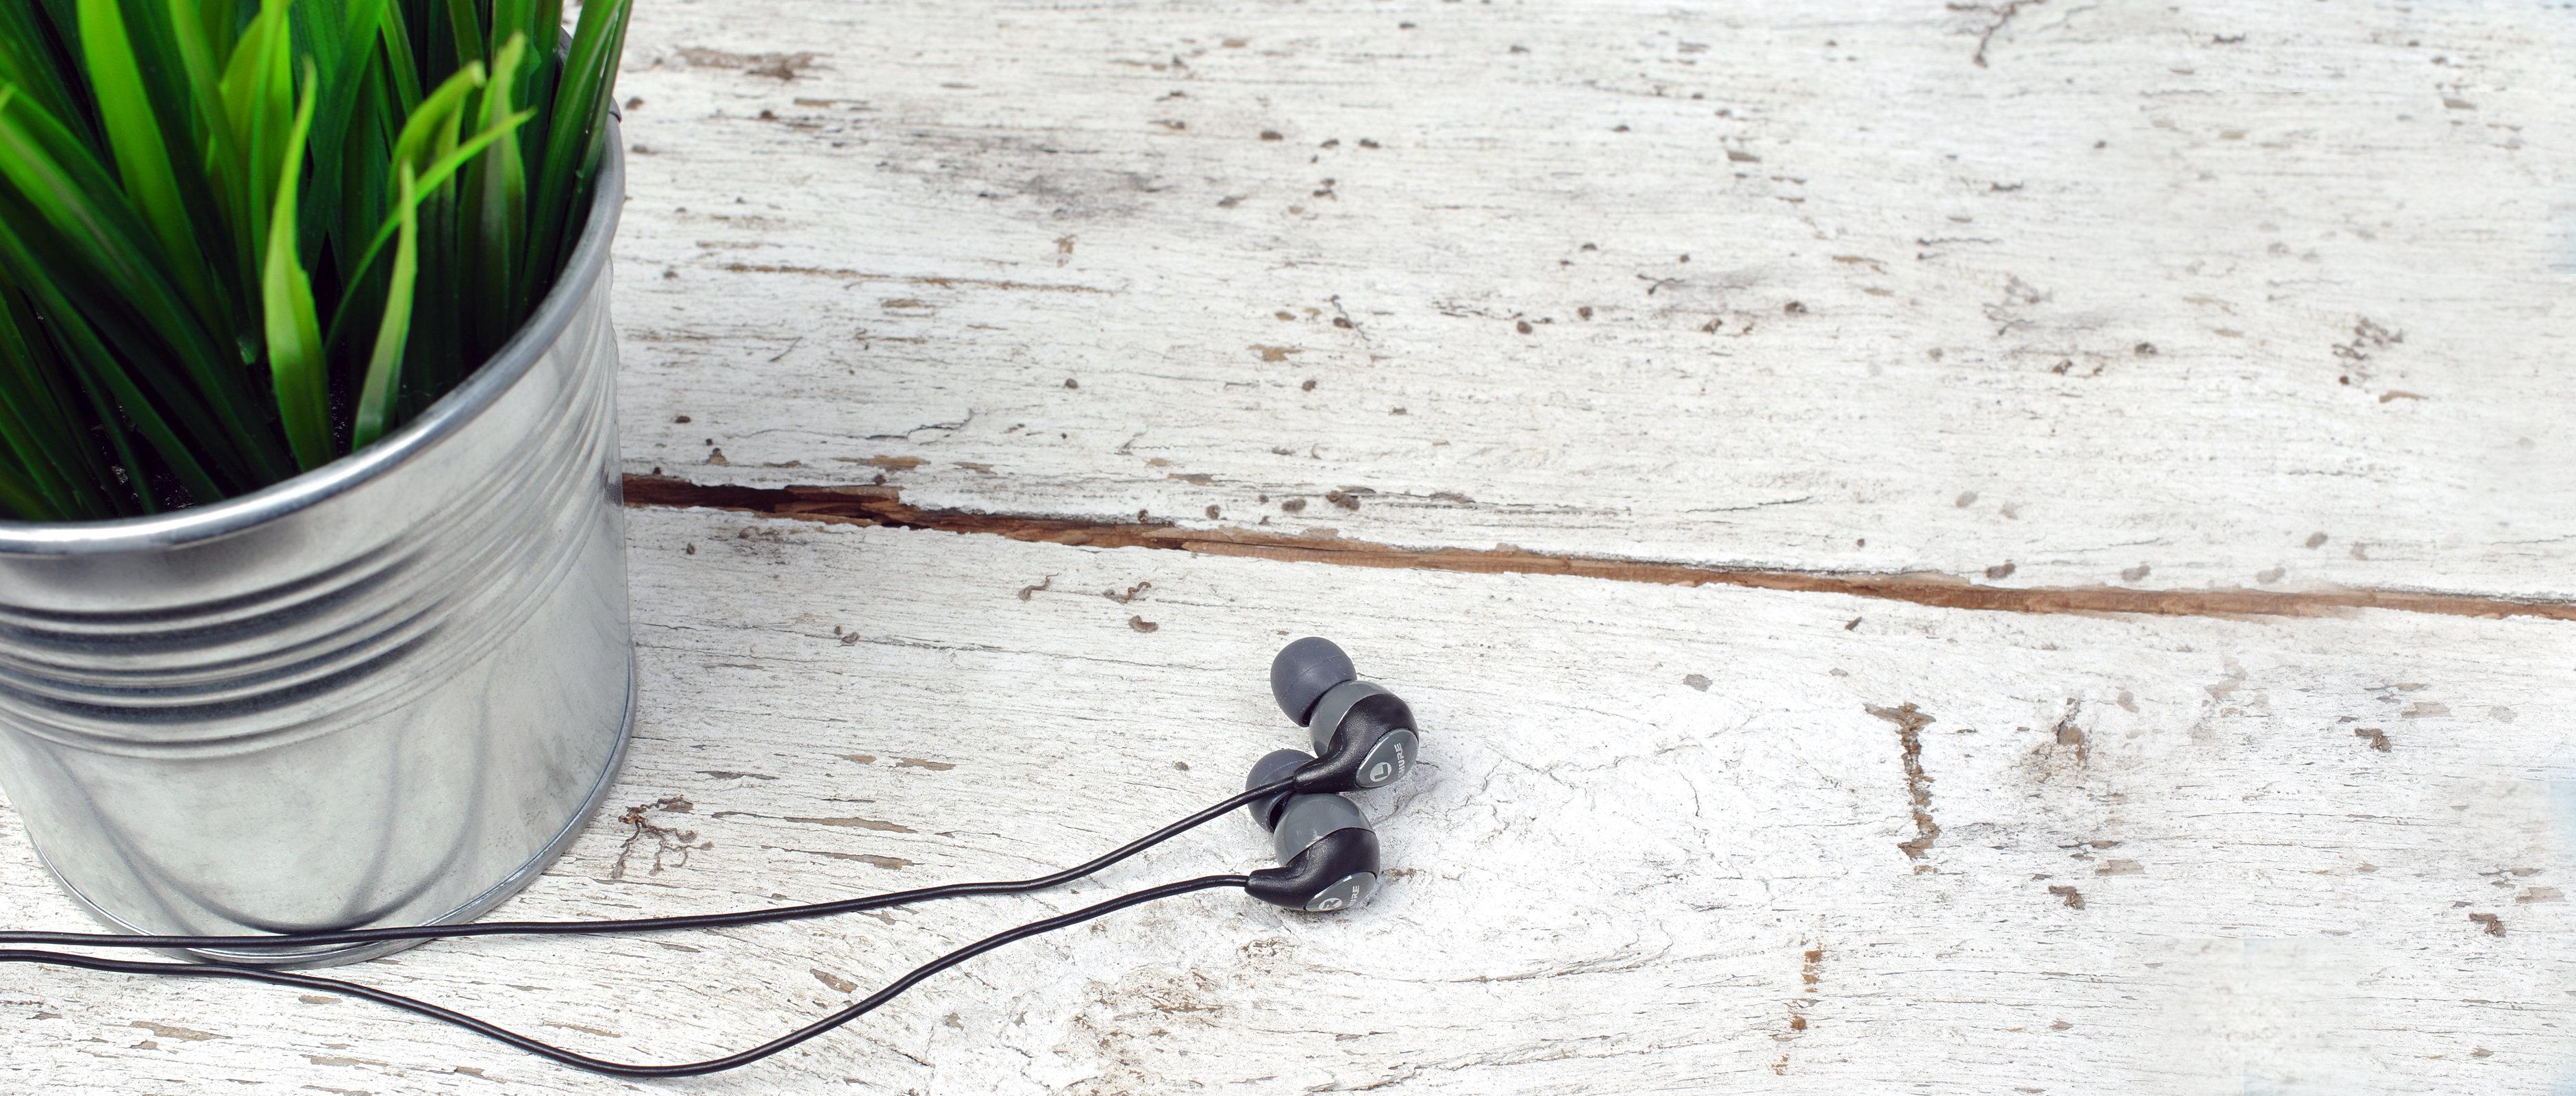 The Shure SE112 in-ear headphones